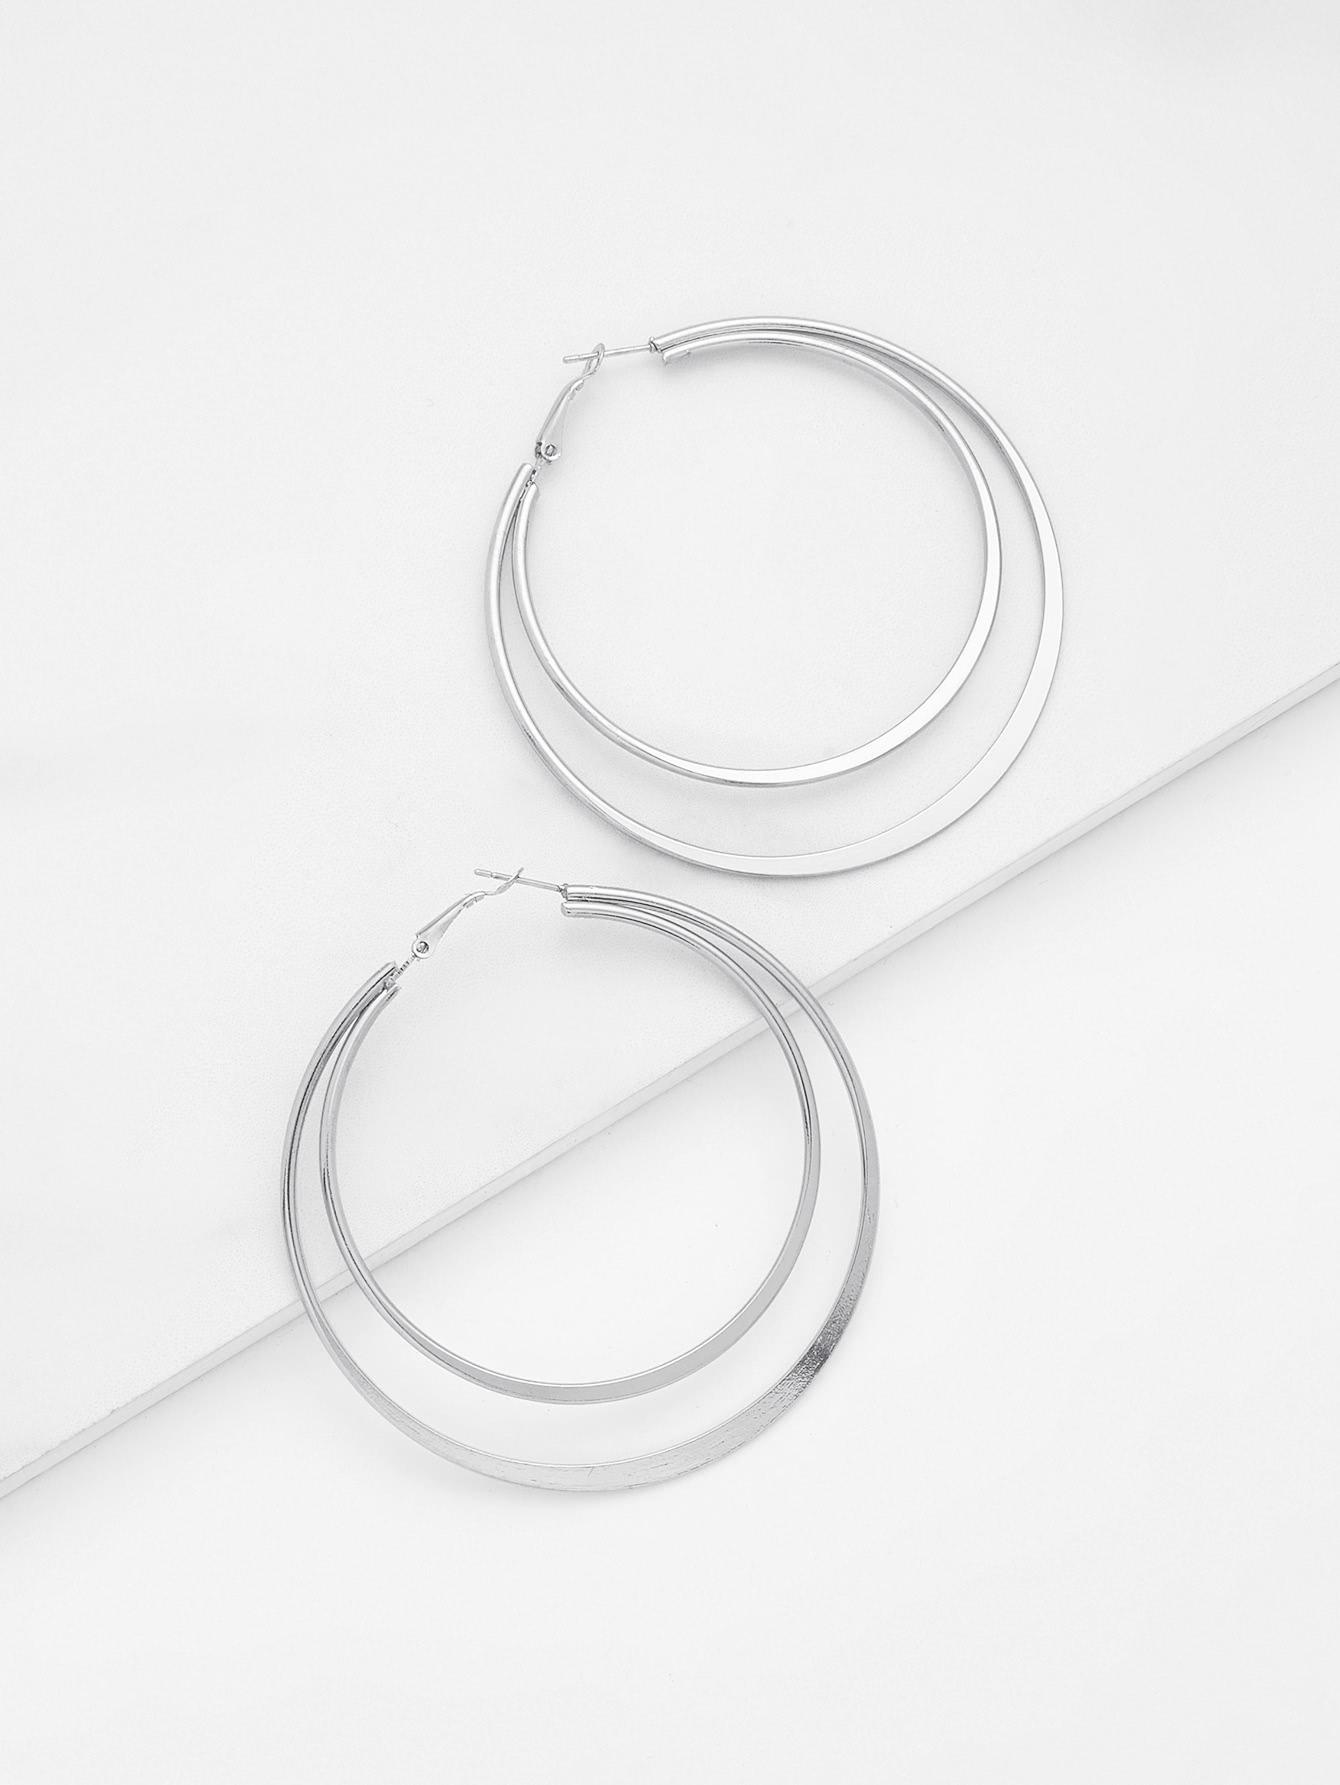 Double Layered Open Hoop Earrings layered wrap hoop earrings